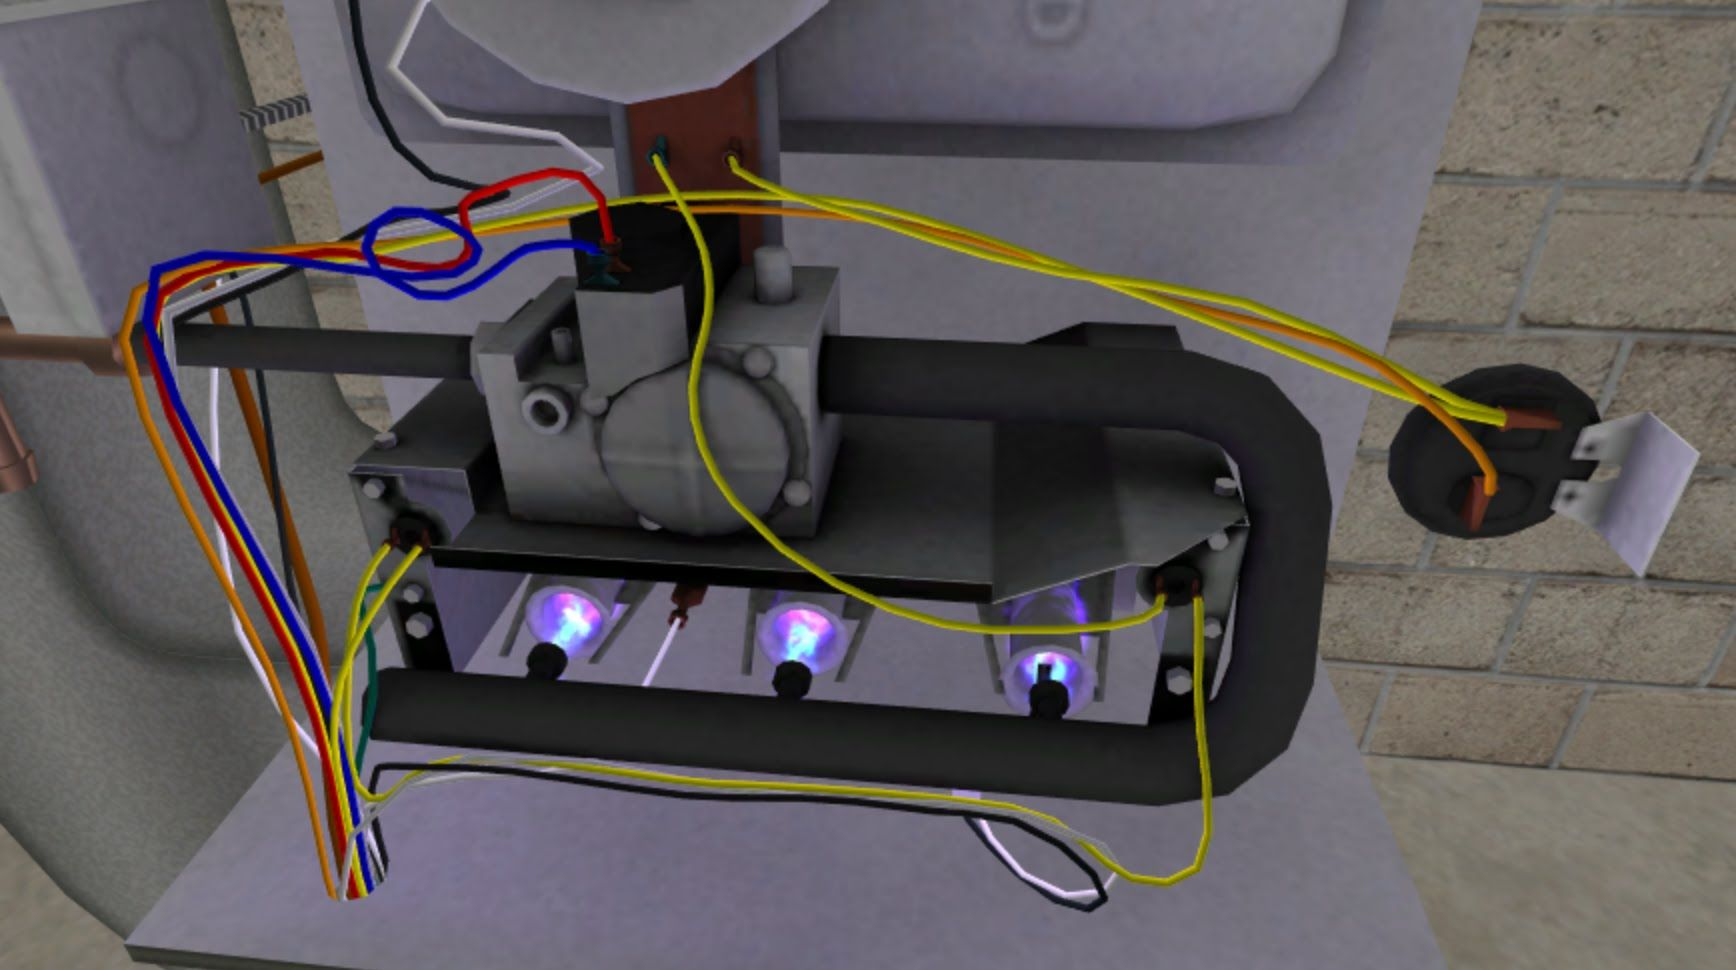 Faulty flame sensor on a gas furnace troubleshooting video